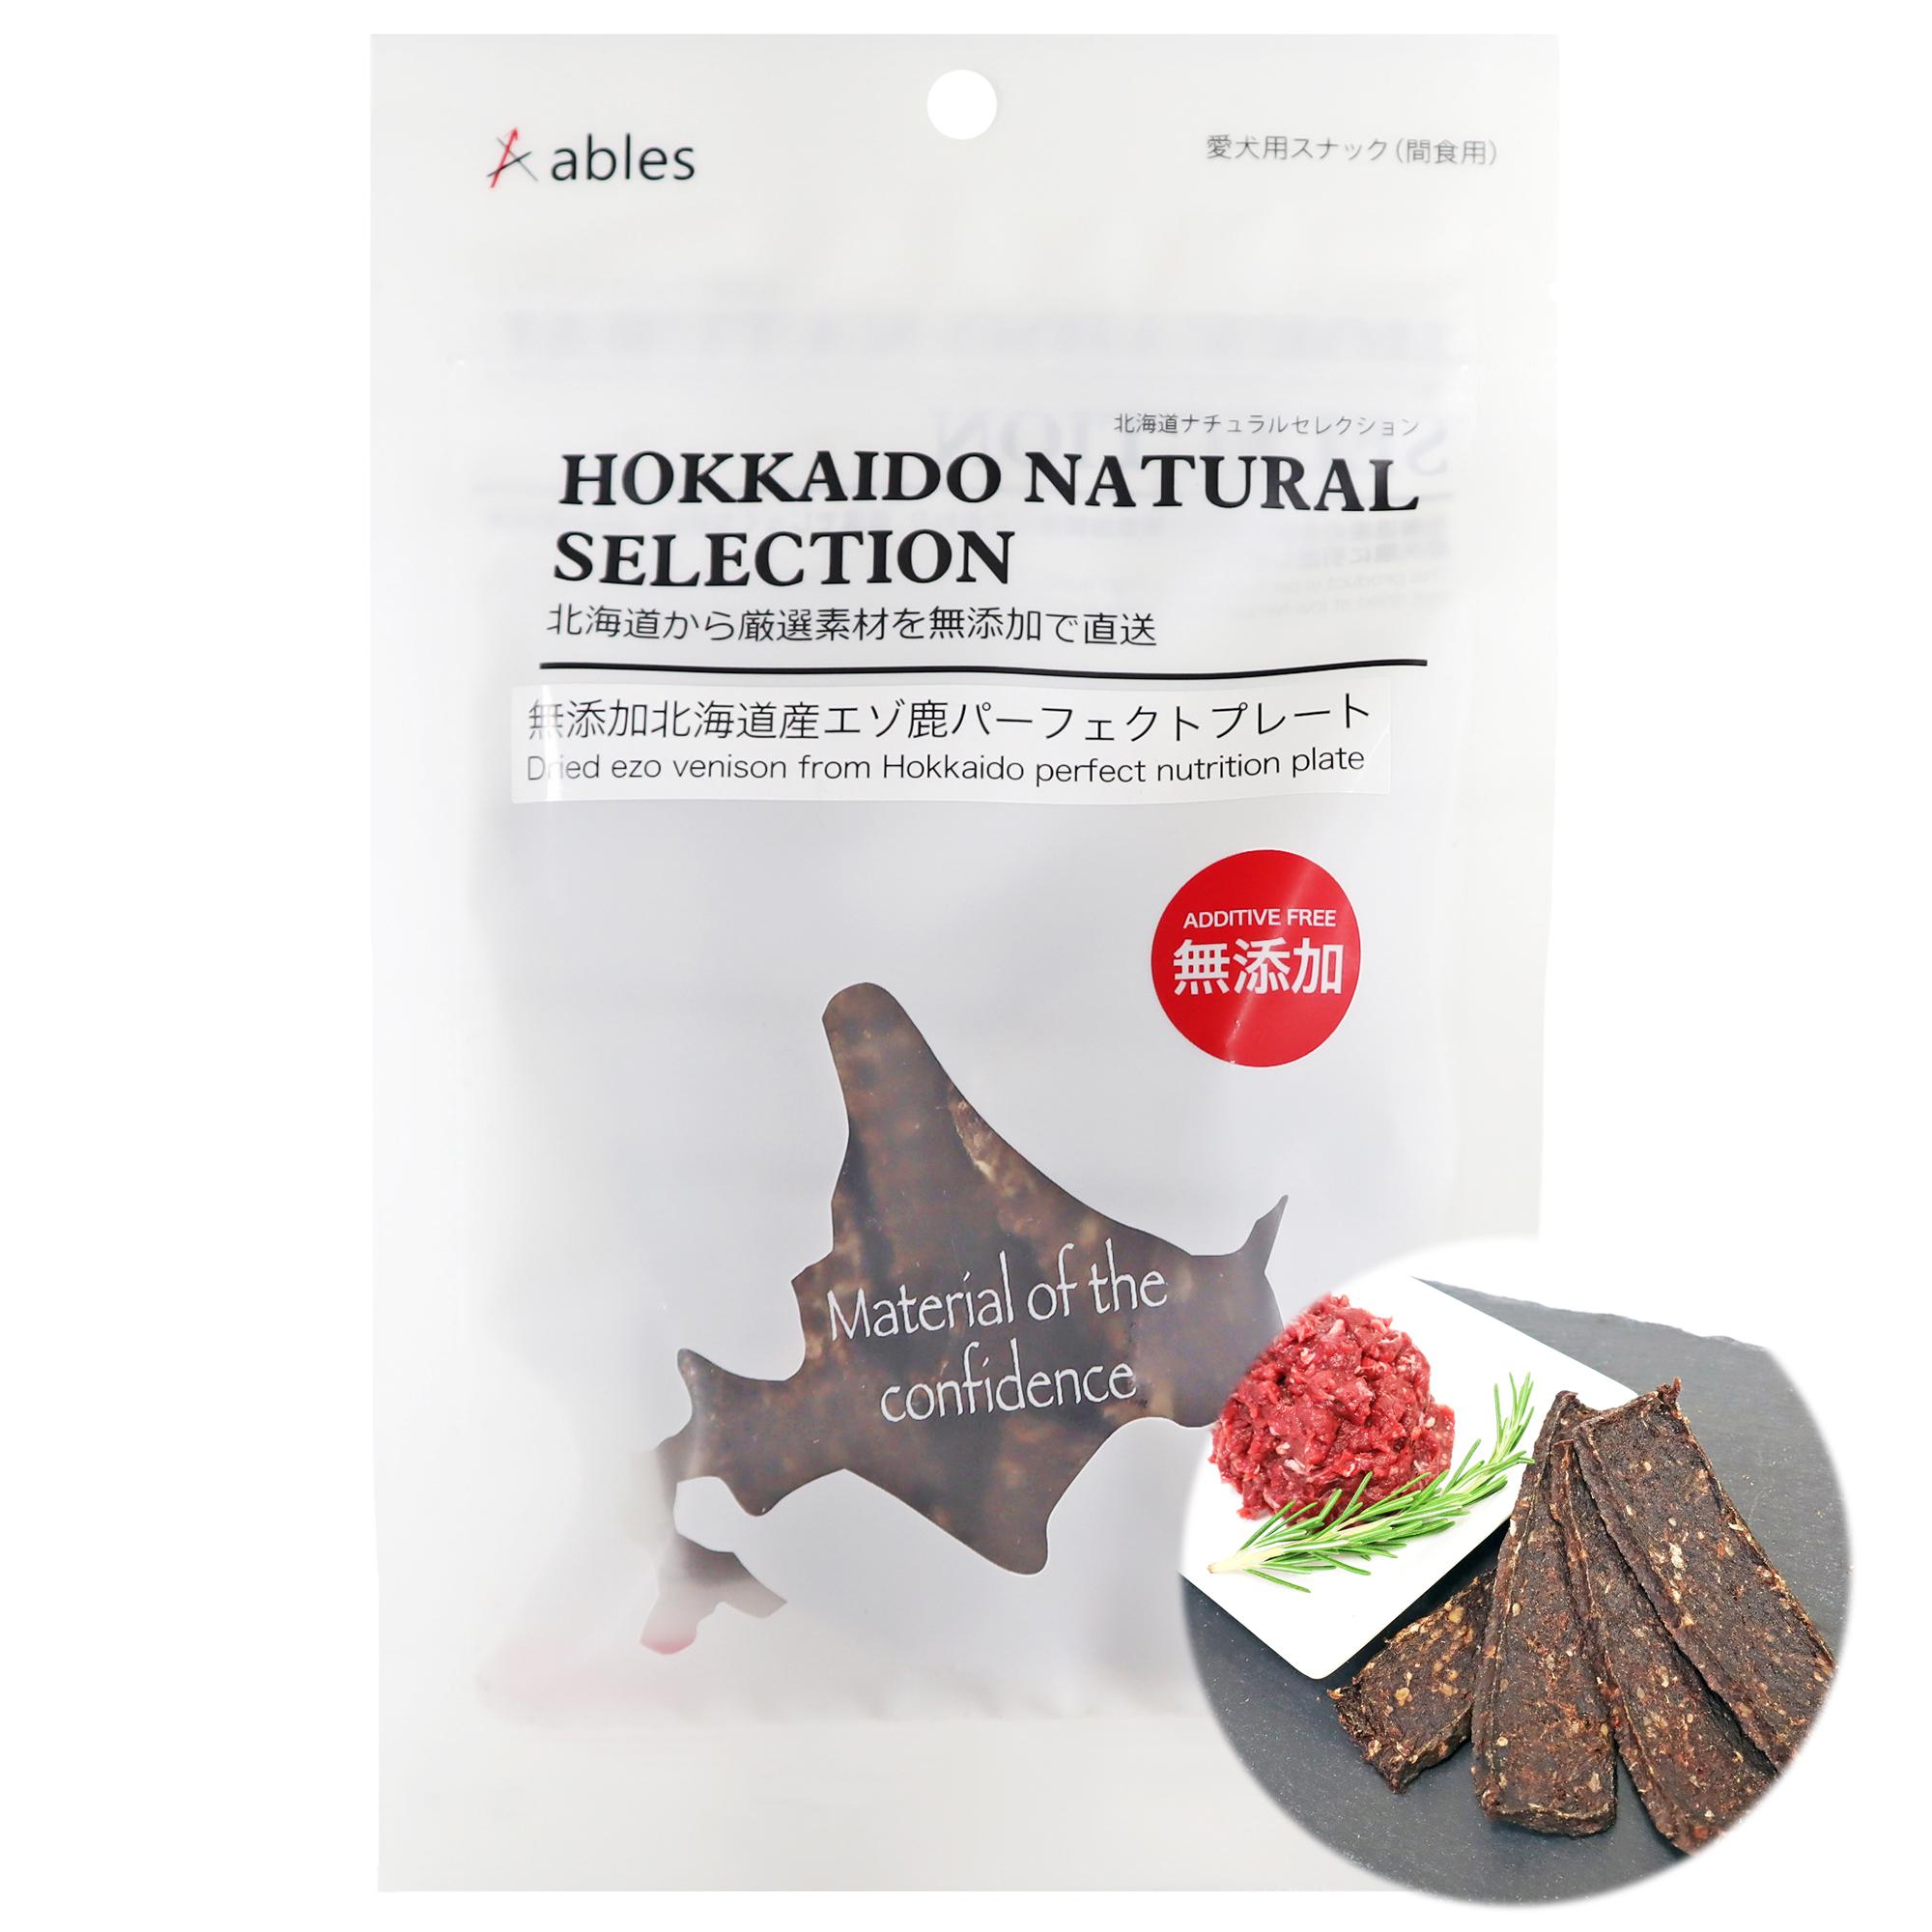 HOKKAIDO NATURAL SELECTION 無添加北海道産エゾ鹿 パーフェクトプレート 30g